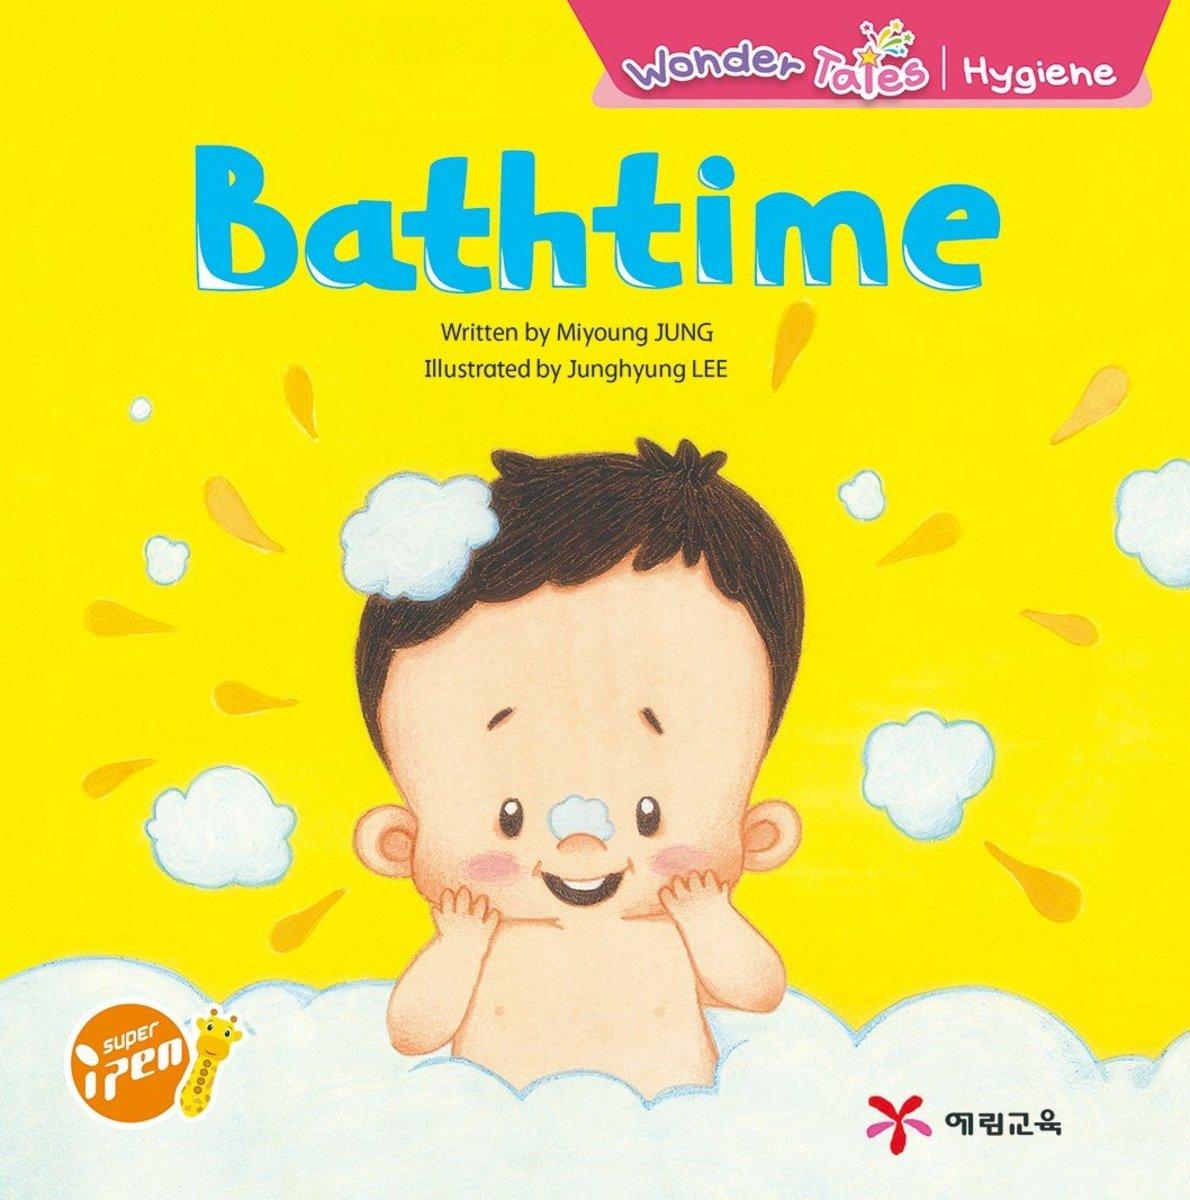 Wonder Tales 英文繪本 (K1)—Bathtime